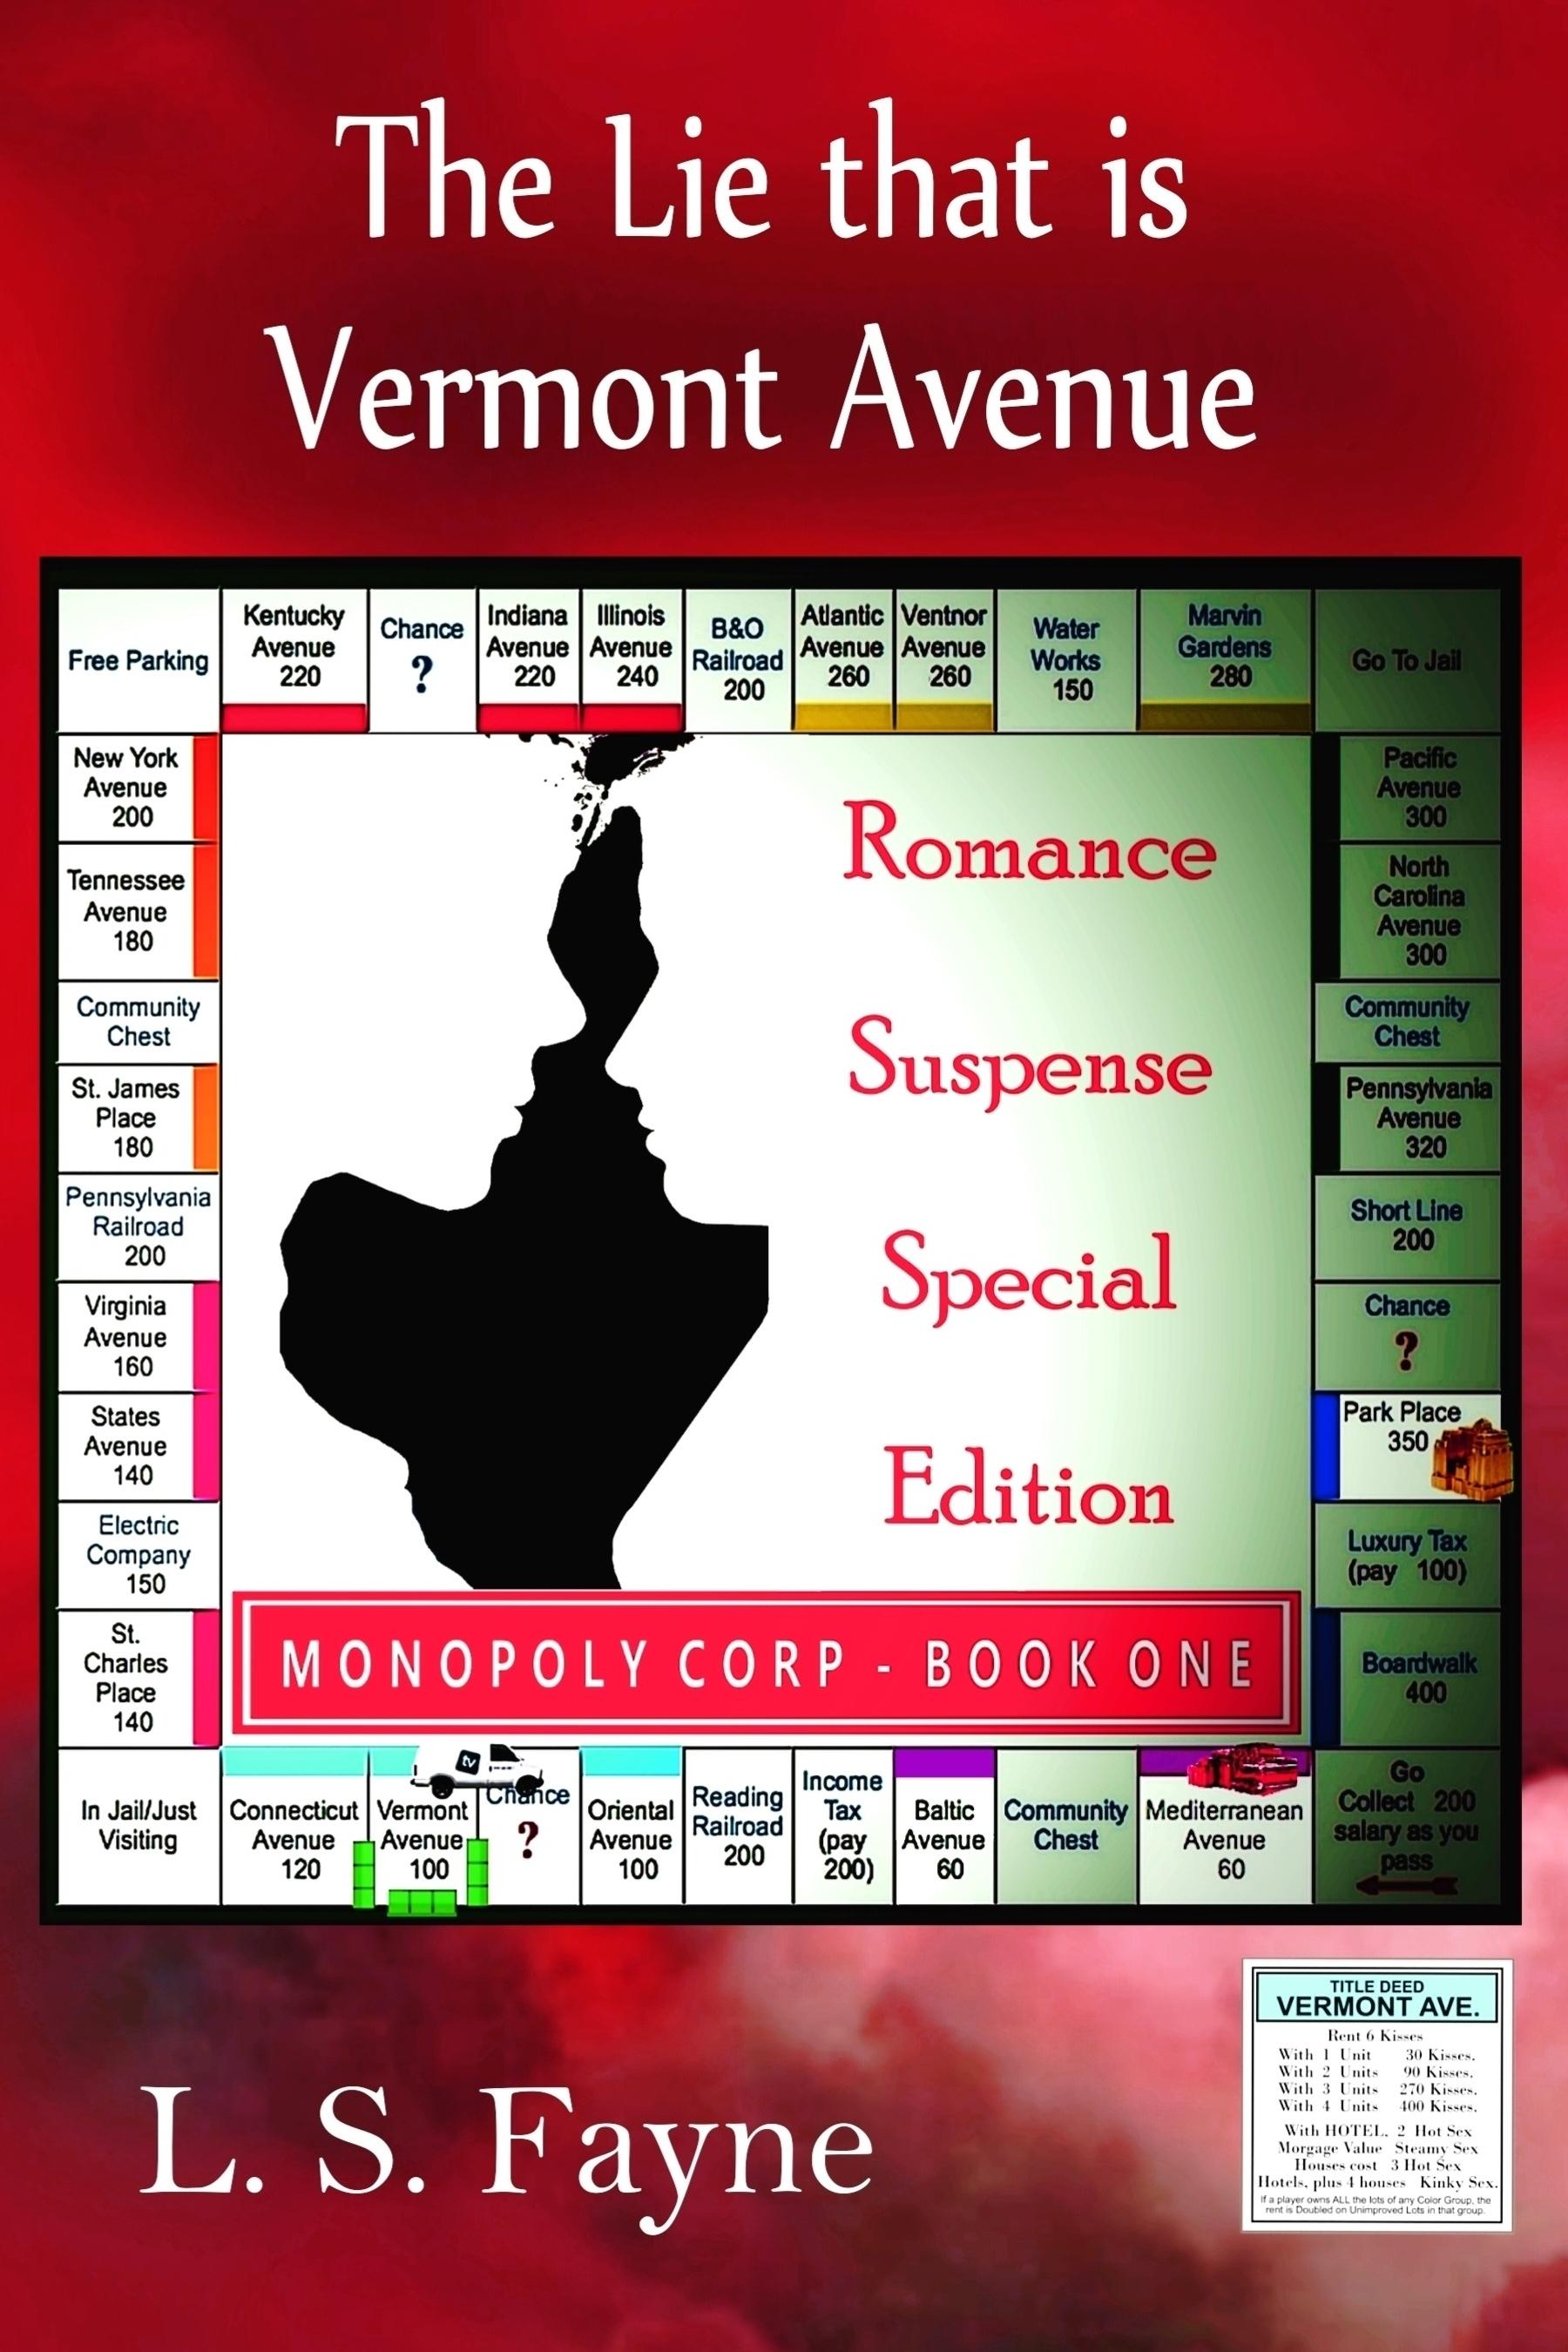 The Lie that is Vermont Avenue L. S. Fayne